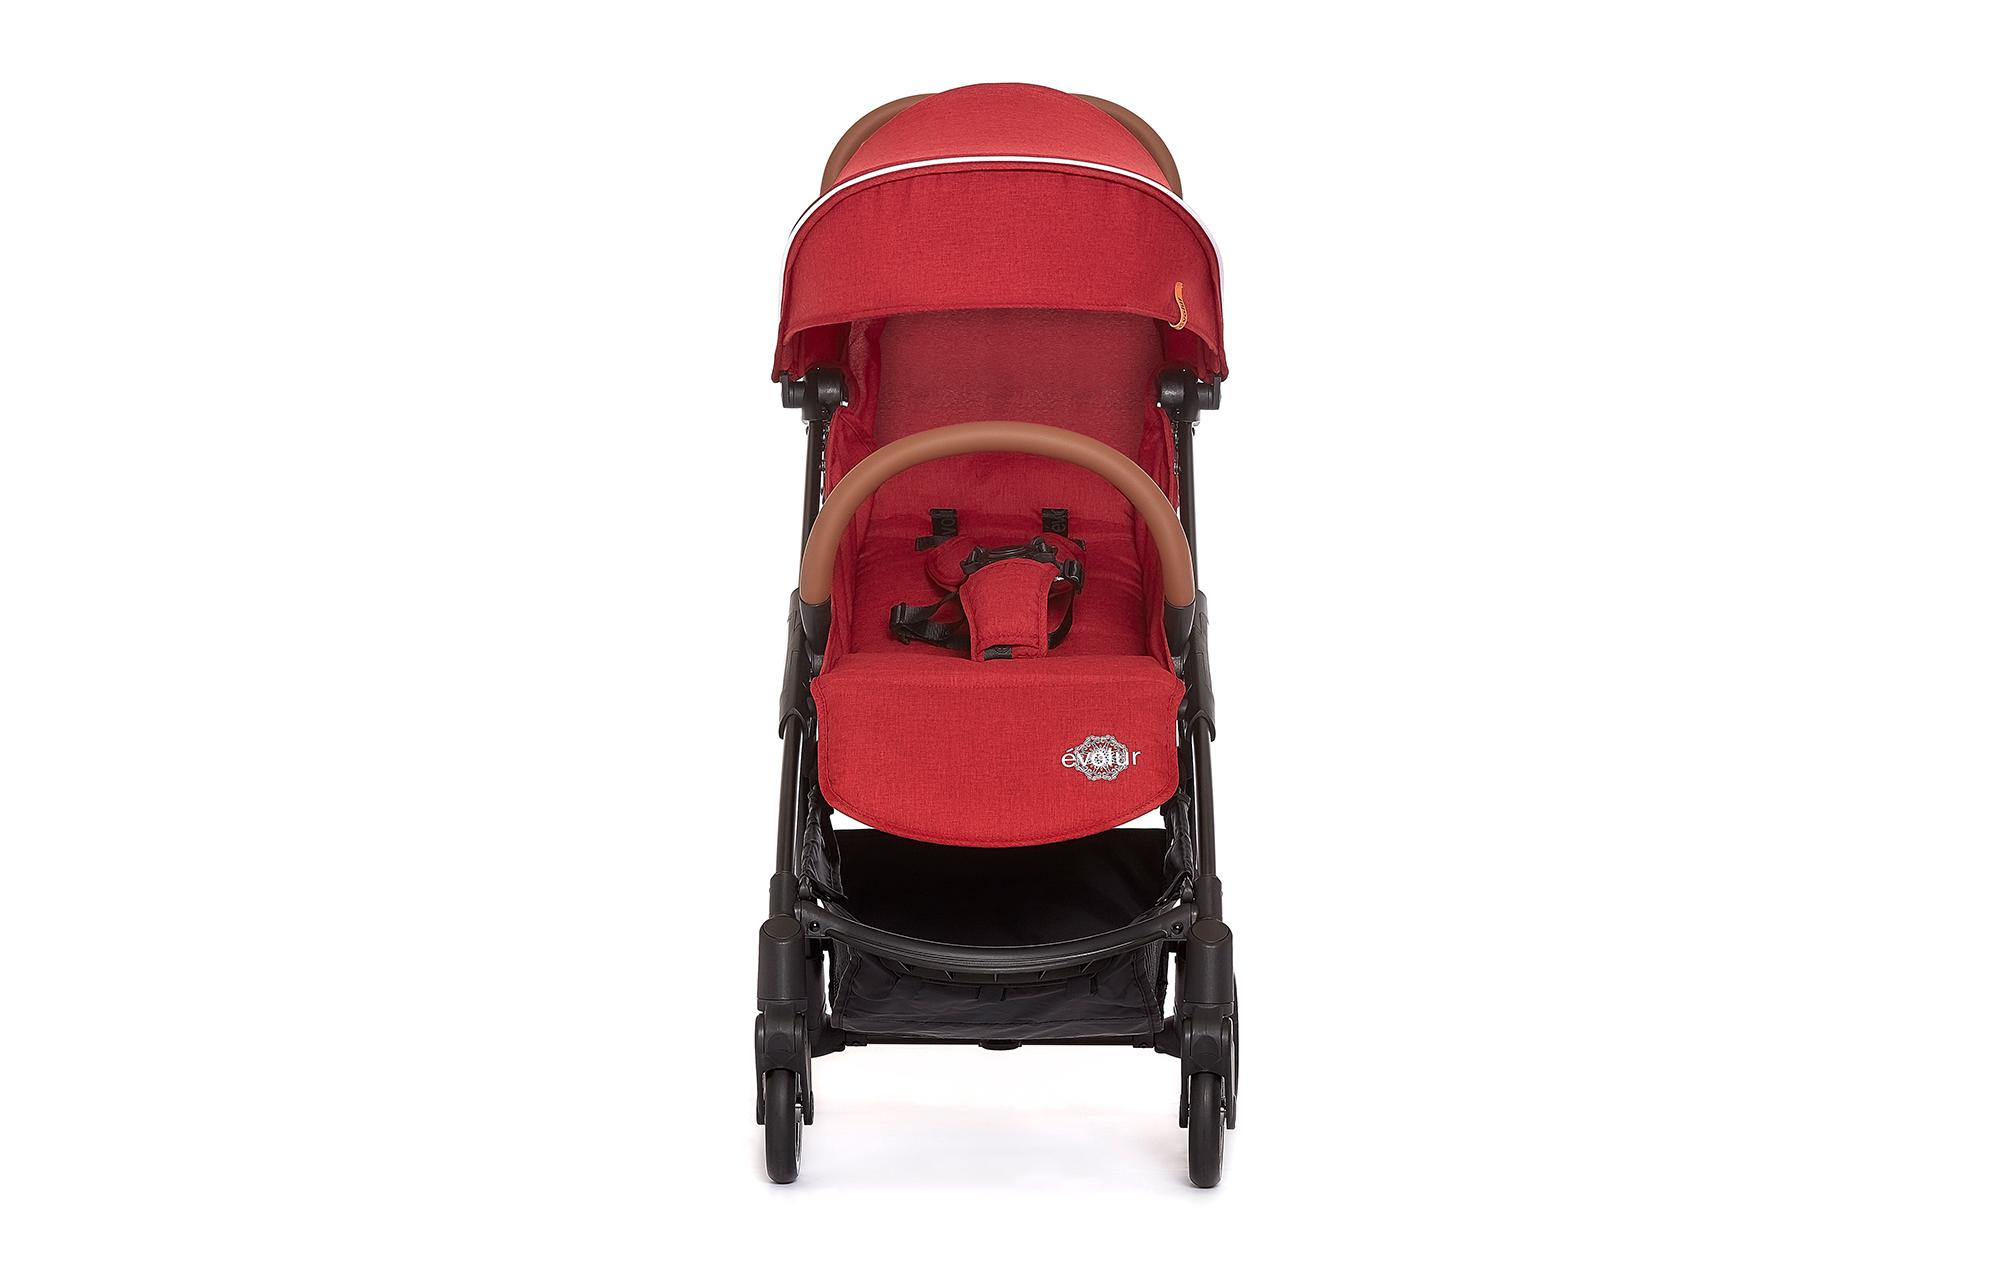 Evolur Vogue Stroller Red 02